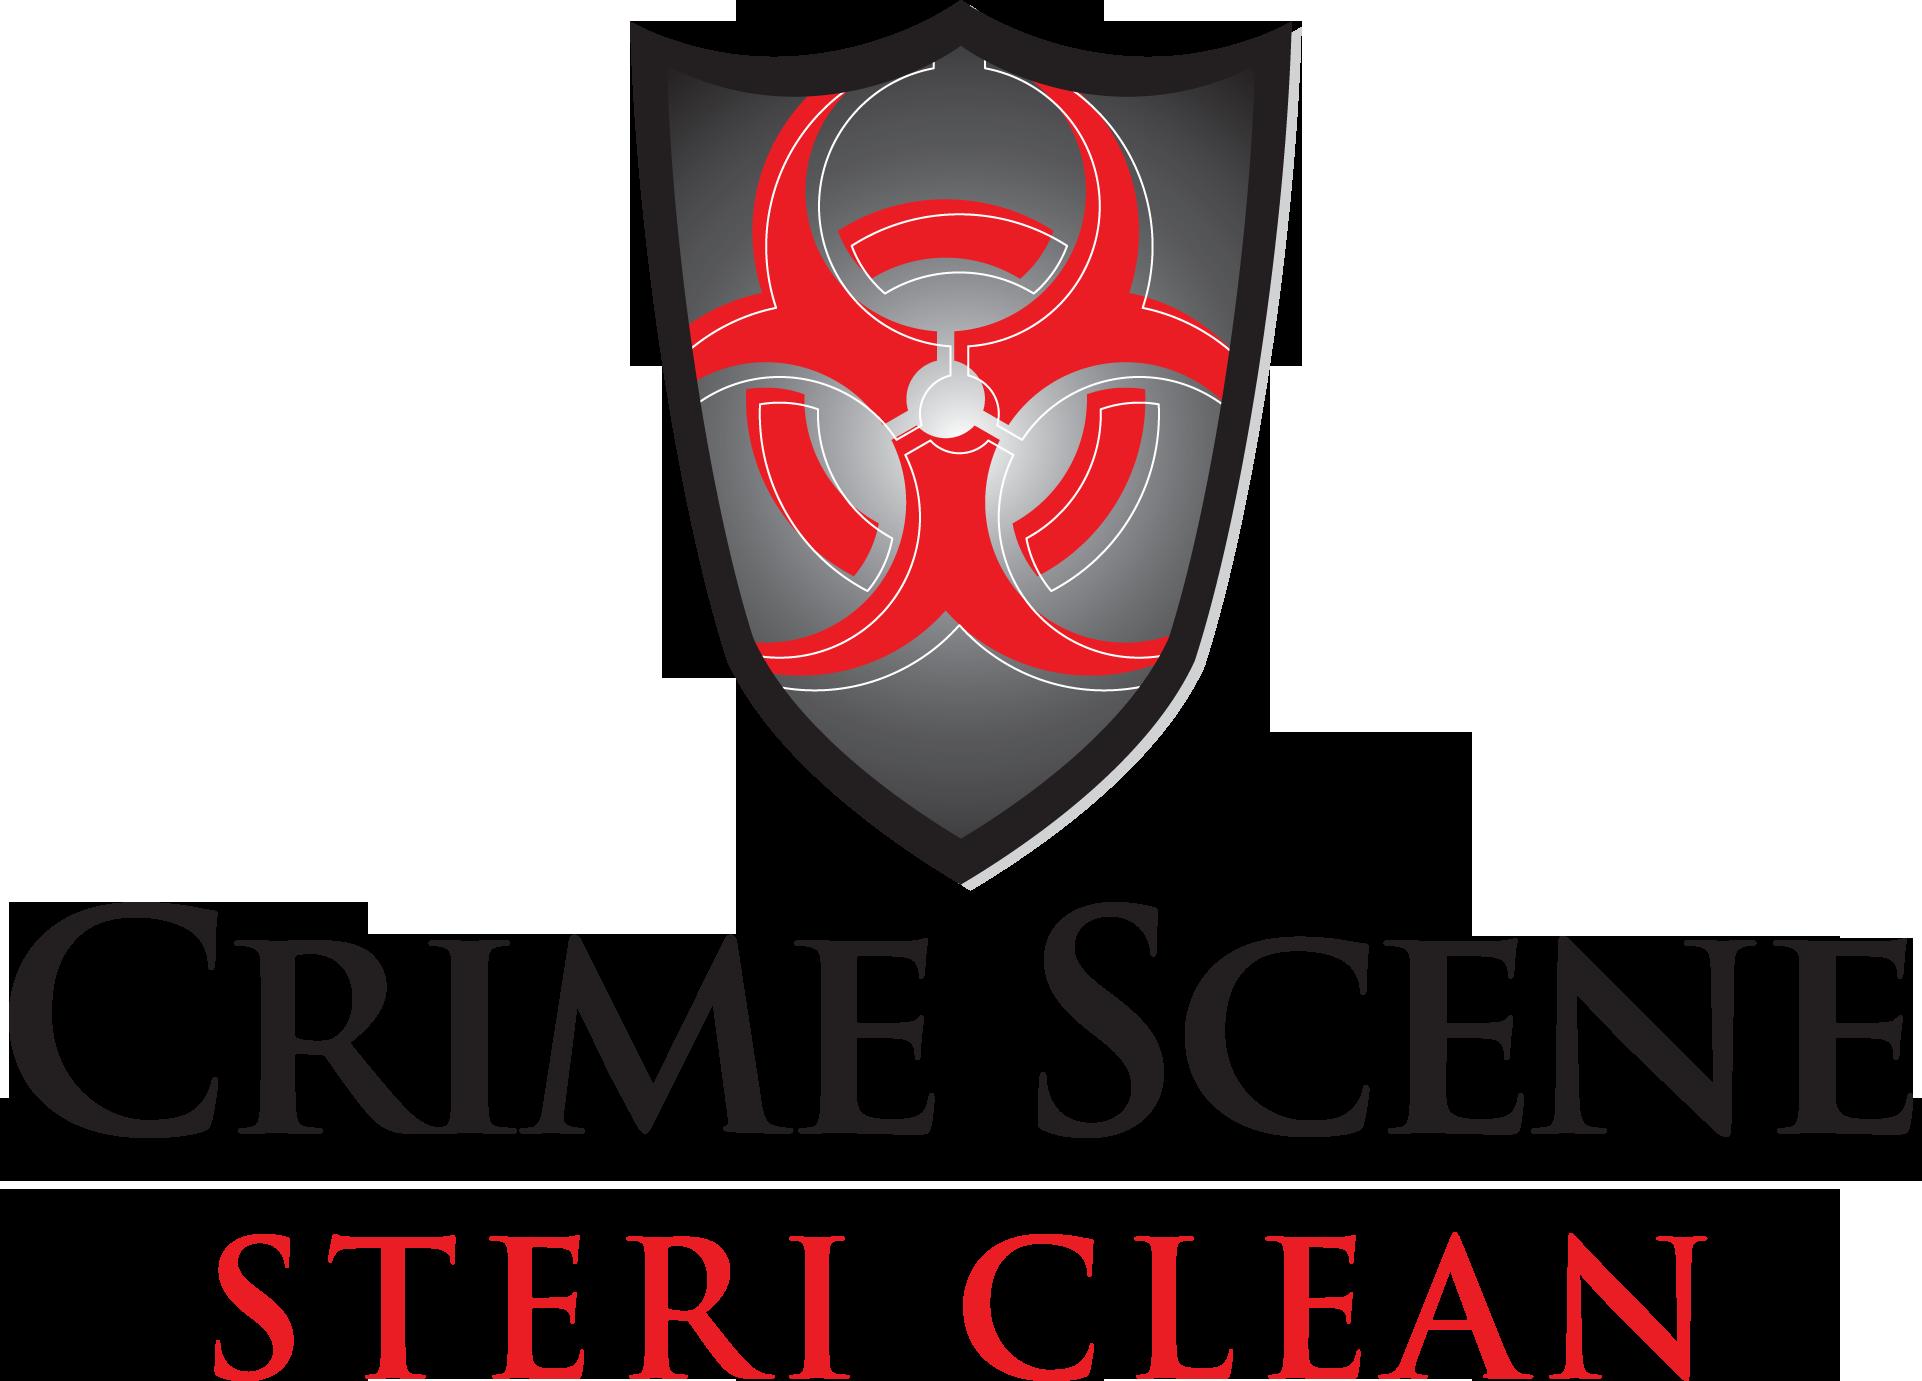 Crime clipart crime scene. Steri clean up franchise